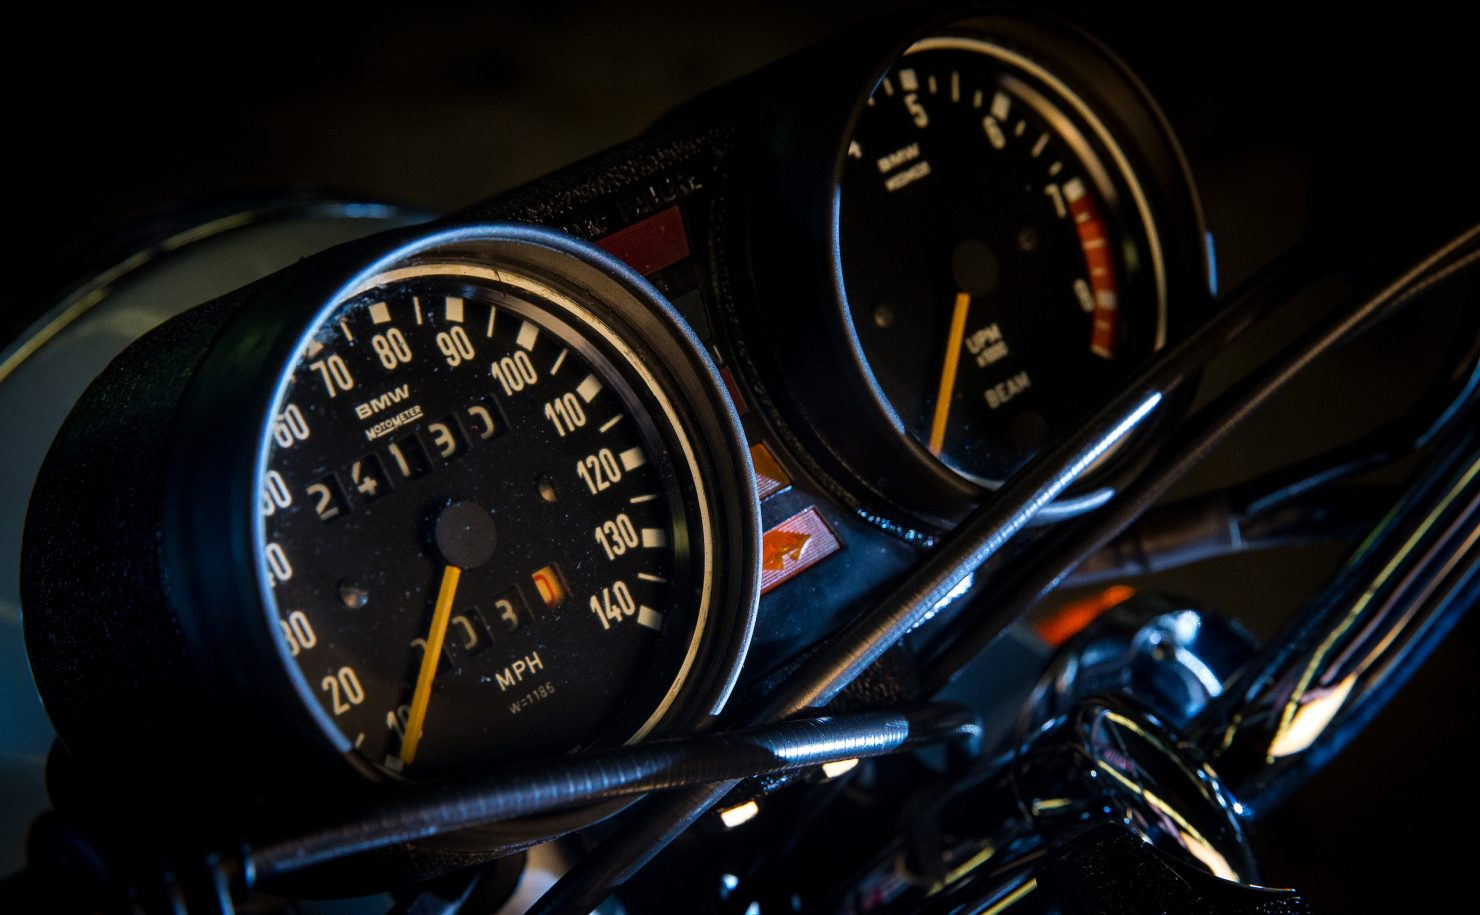 AM6P0462 1480x915 - Immaculately Restored: BMW R75/6